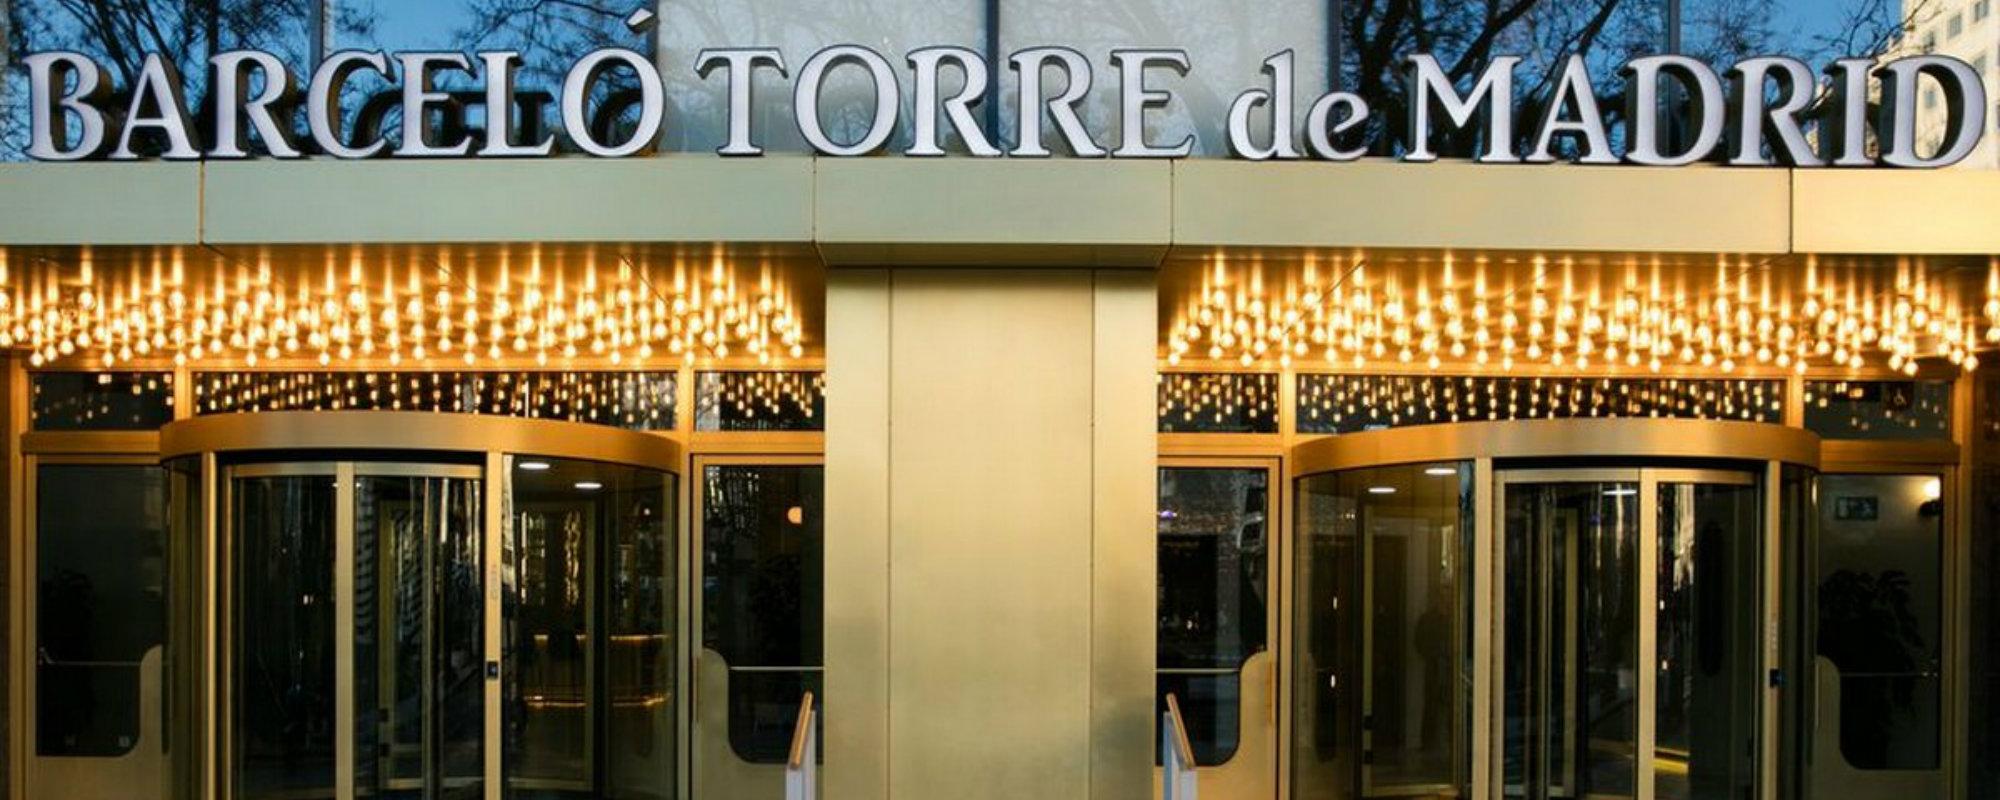 Barcel torre un hotel majestetical en madrid - Hoteles barcelo en madrid ...